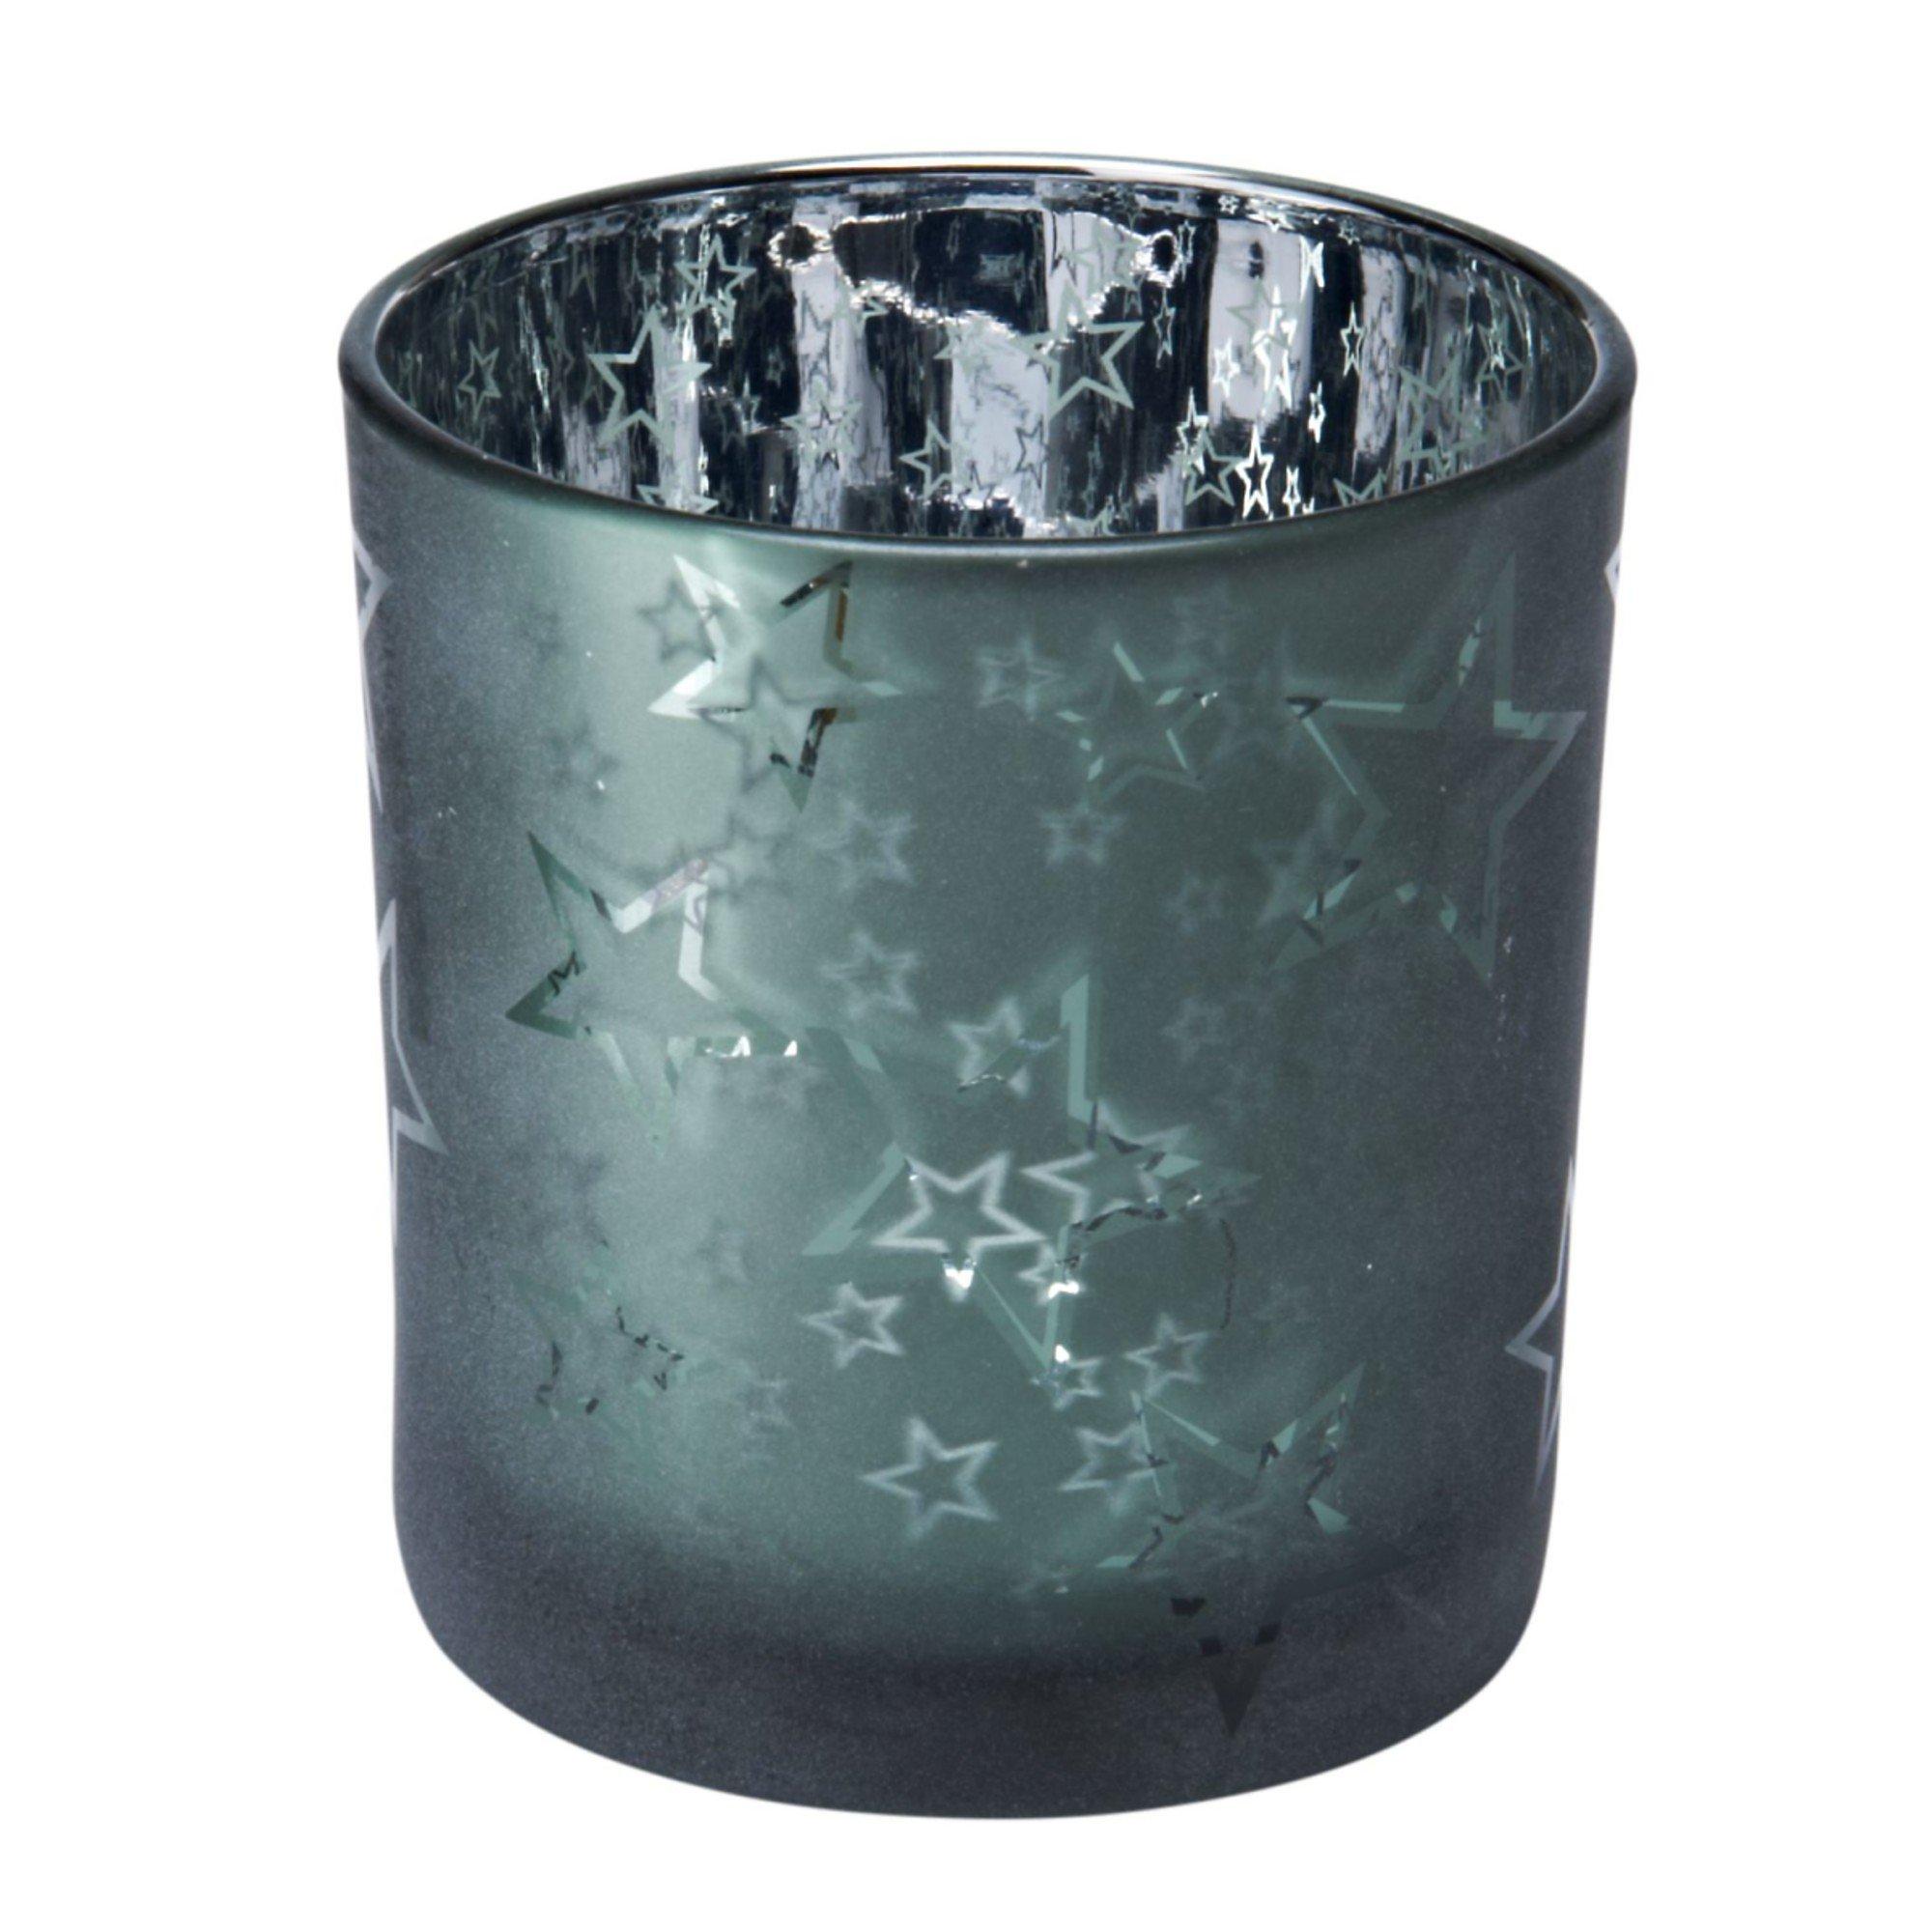 Starlight Weihnachtsbeleuchtung.Teelichthalter Starlight Jetzt Bei Weltbild De Bestellen